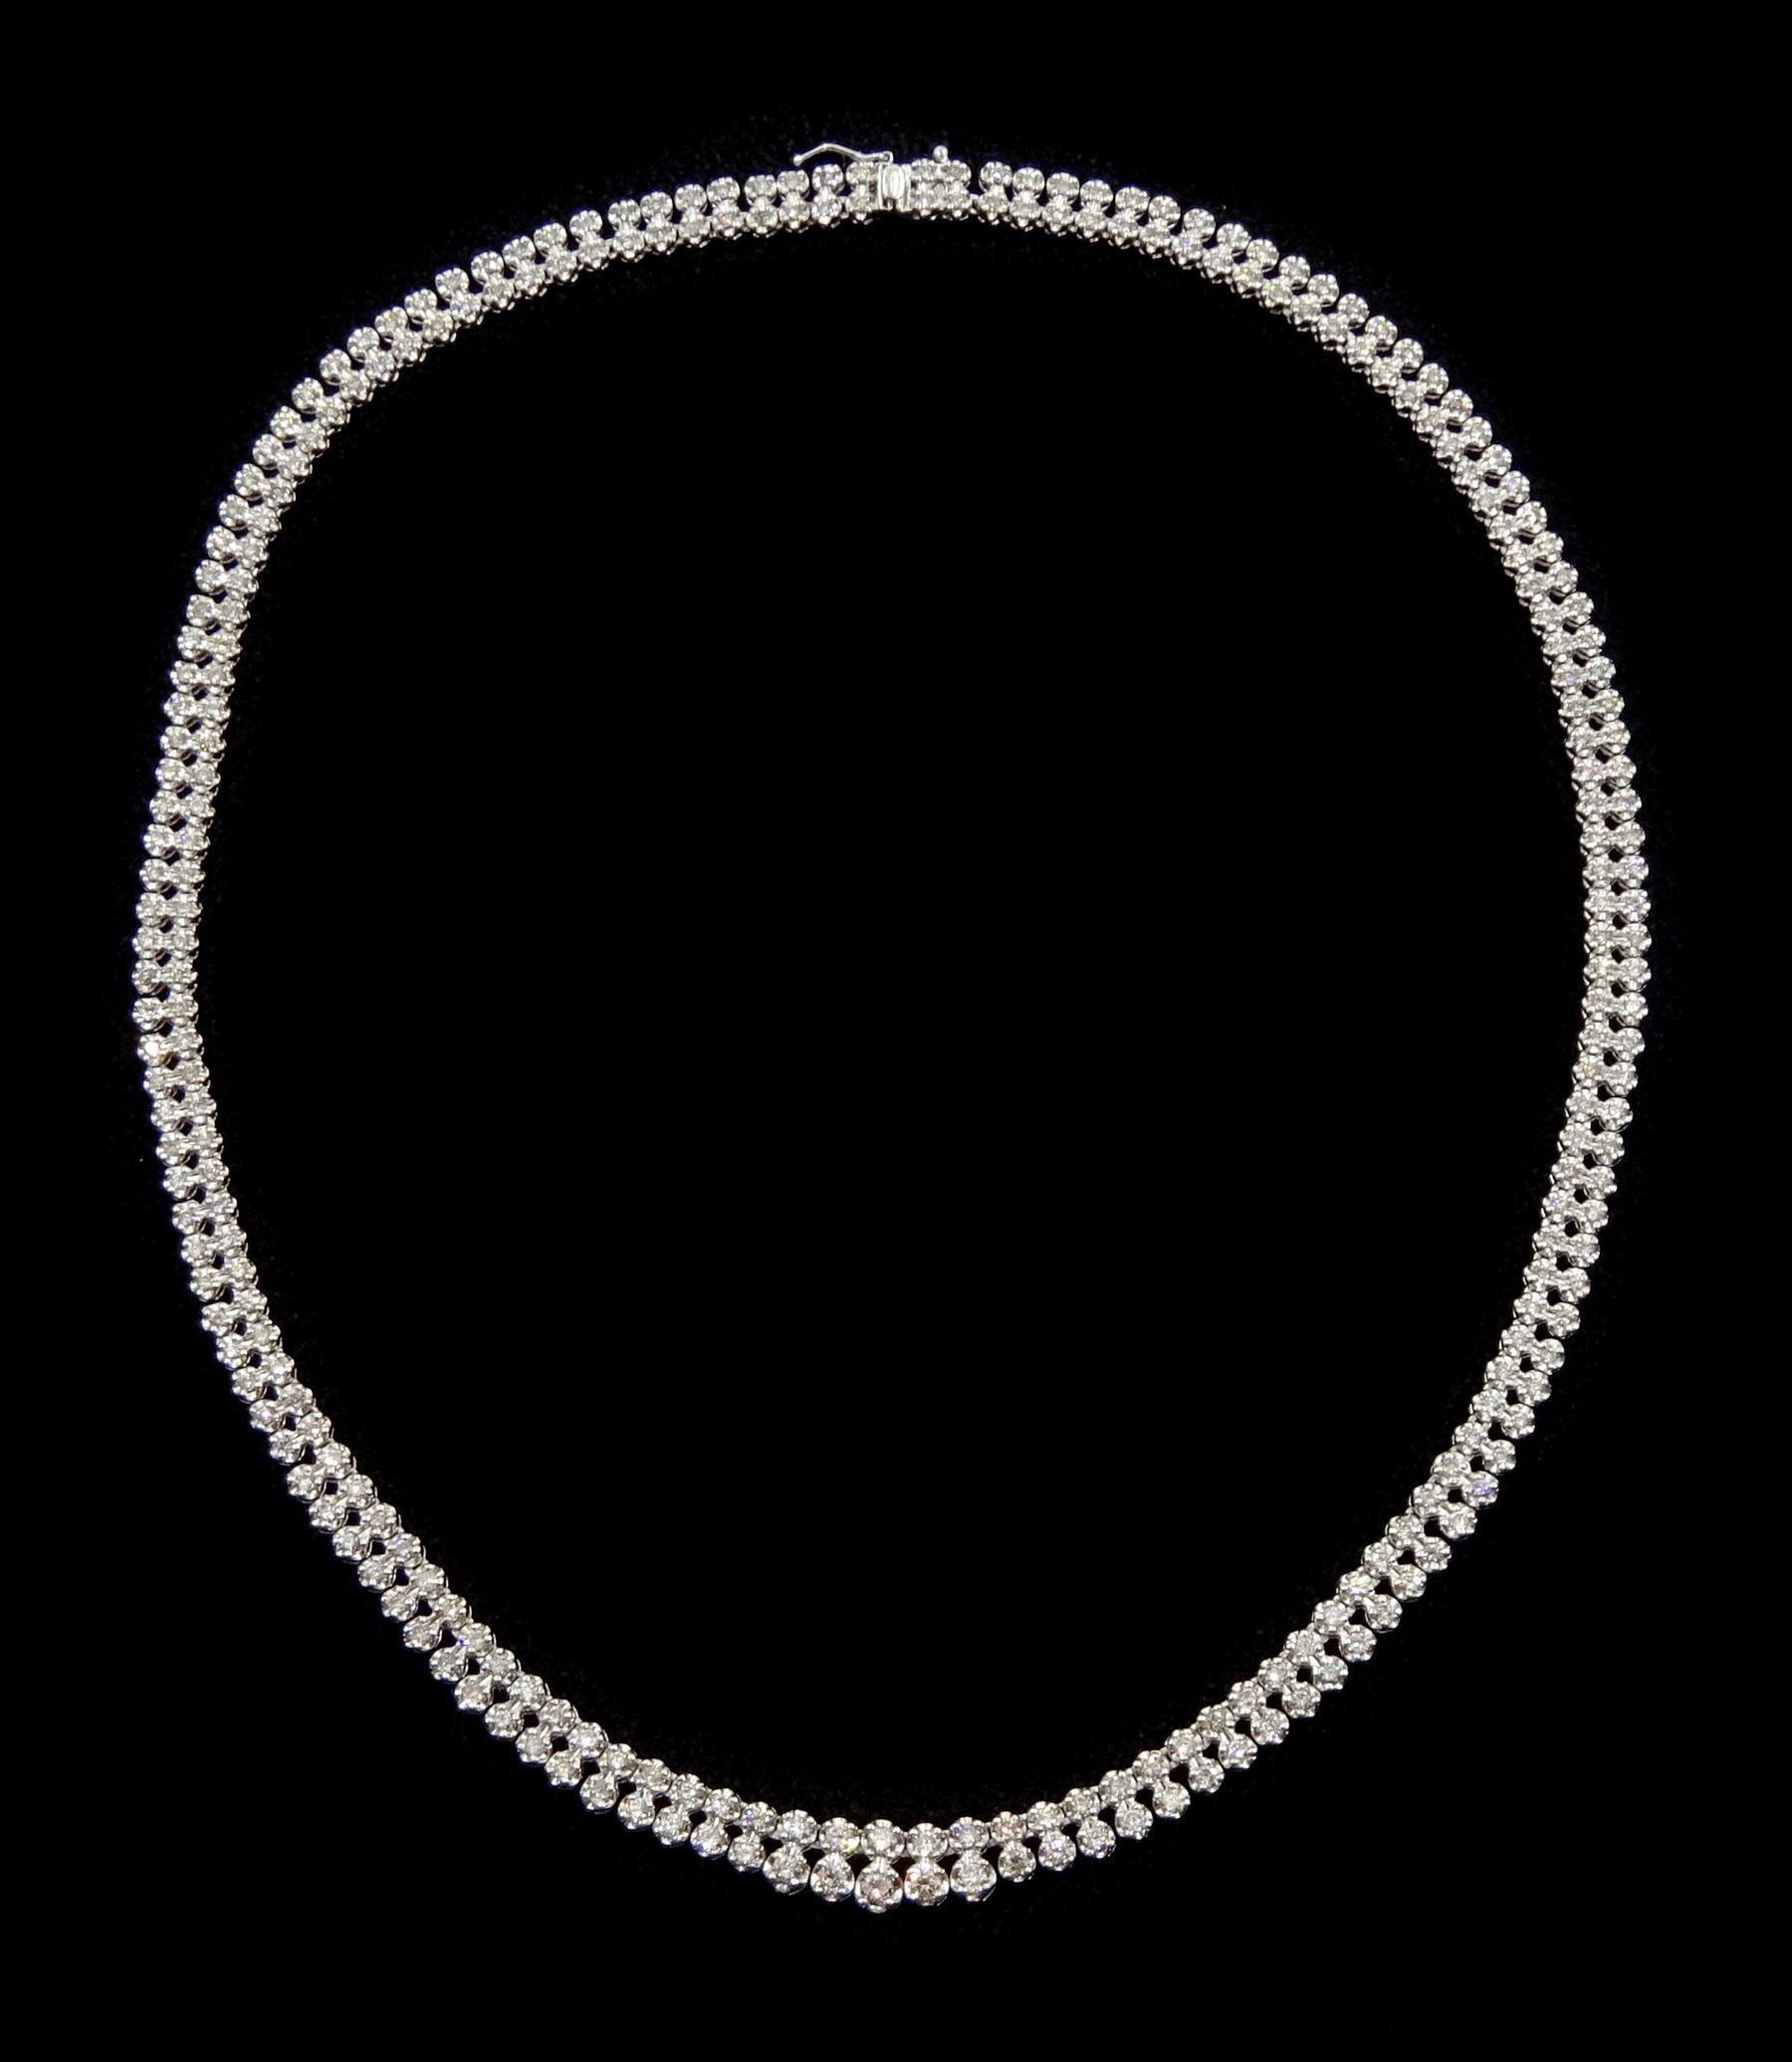 Platinum double row round brilliant cut diamond necklace